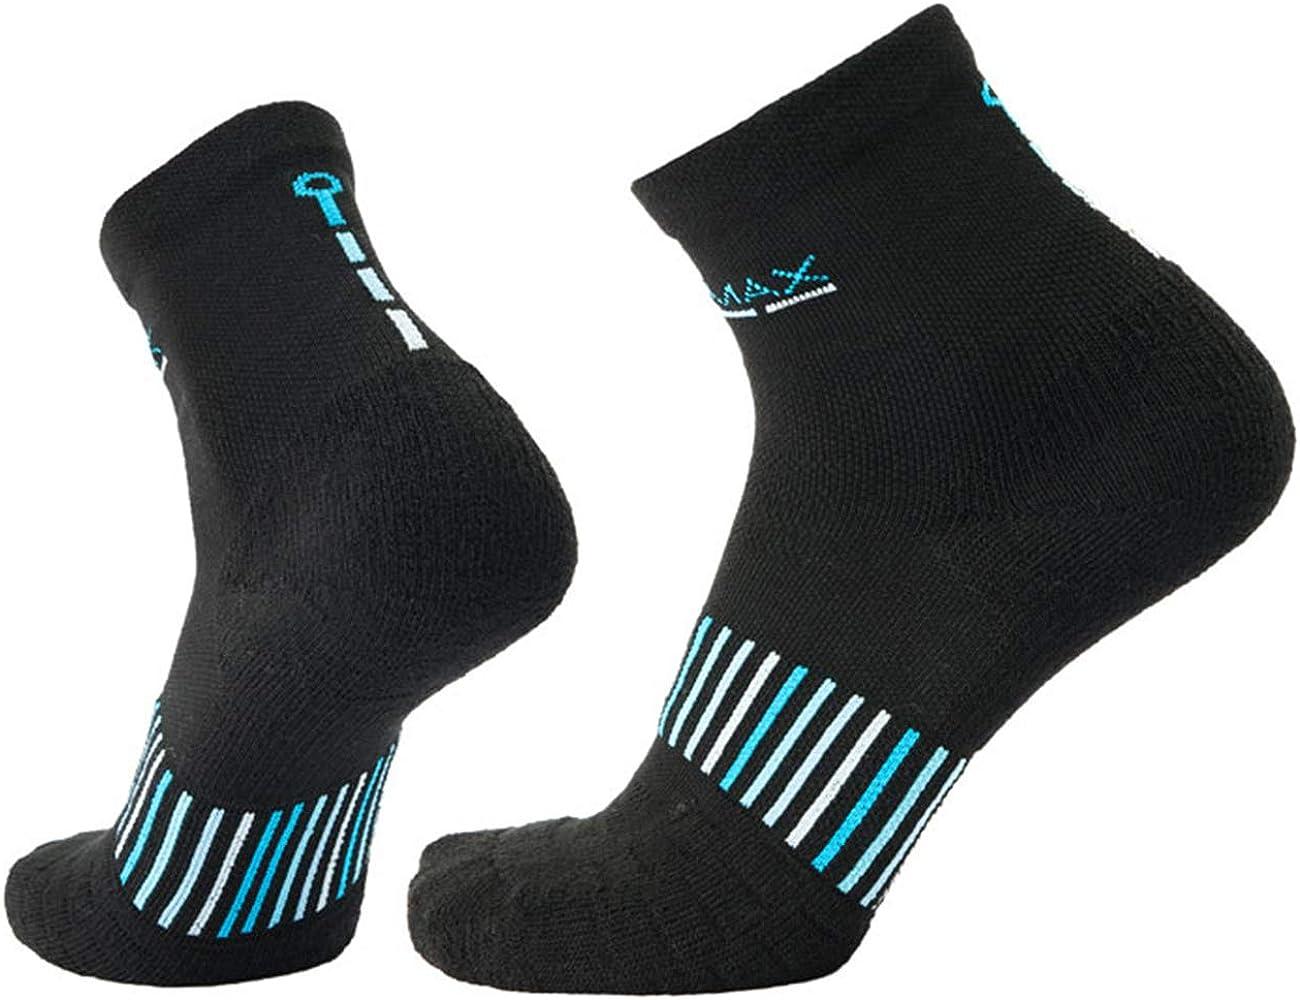 COOLMAX Brand Performance Mild Compression Support(15-18mmhg) Quarter Cushion Socks (3 pairs) for Men & Women Socks